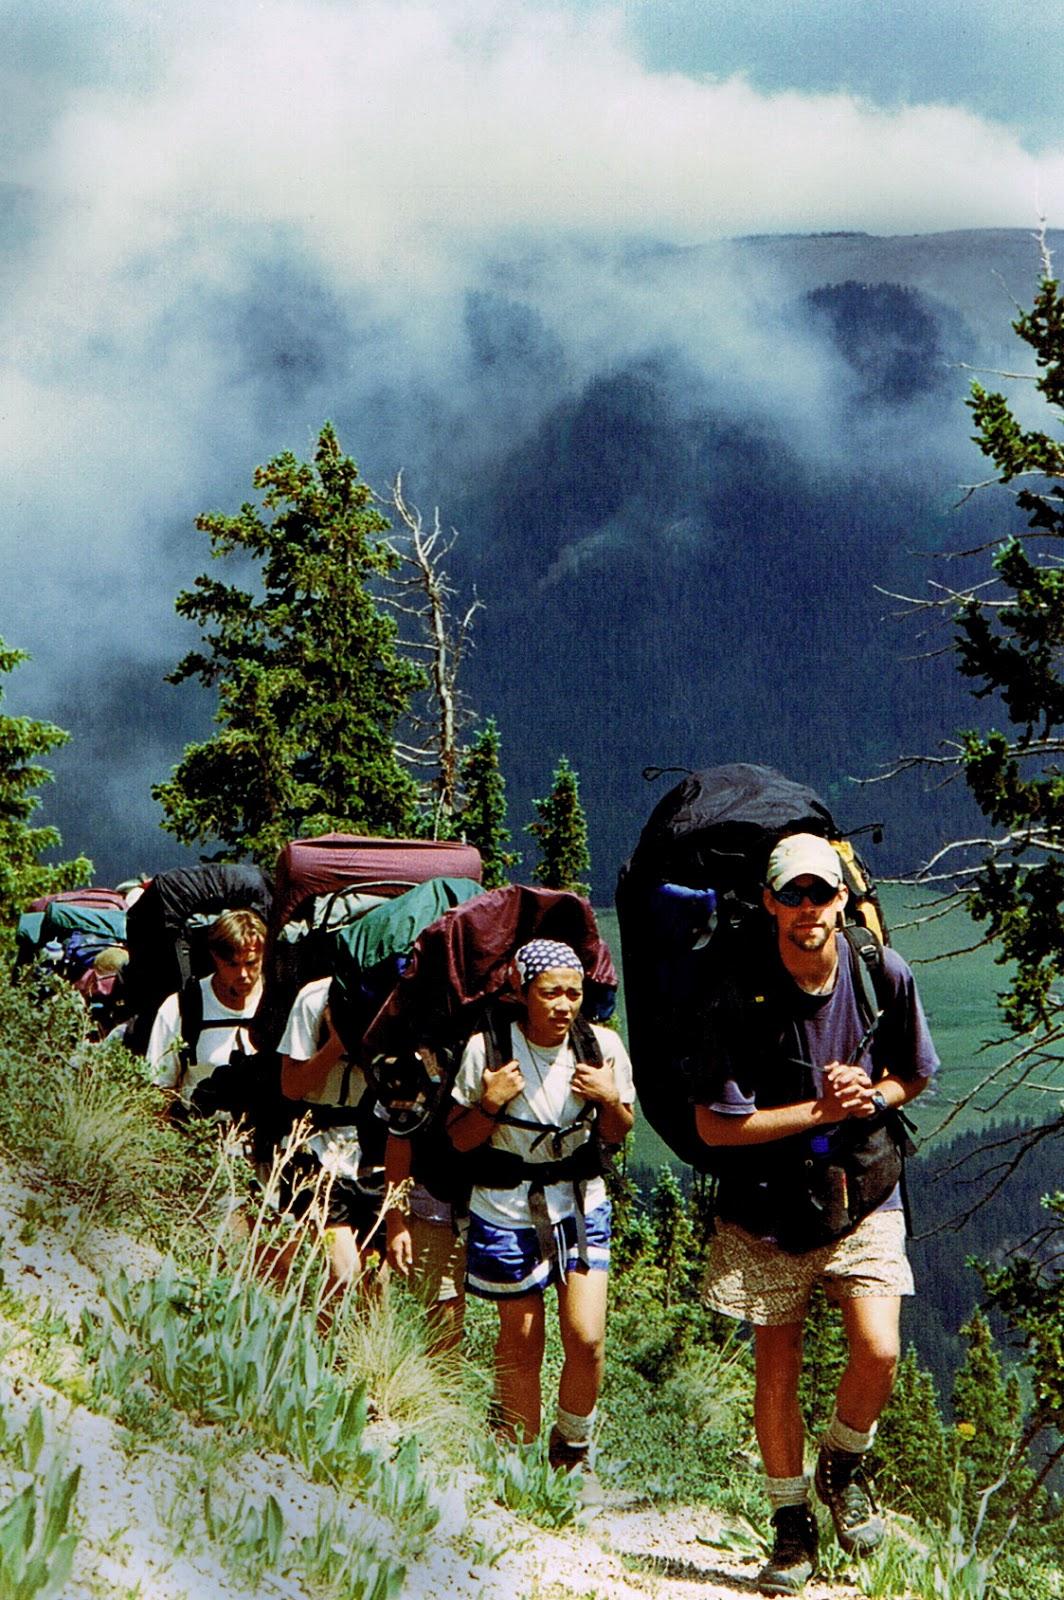 Hiking+up+to+Pyramid.jpg